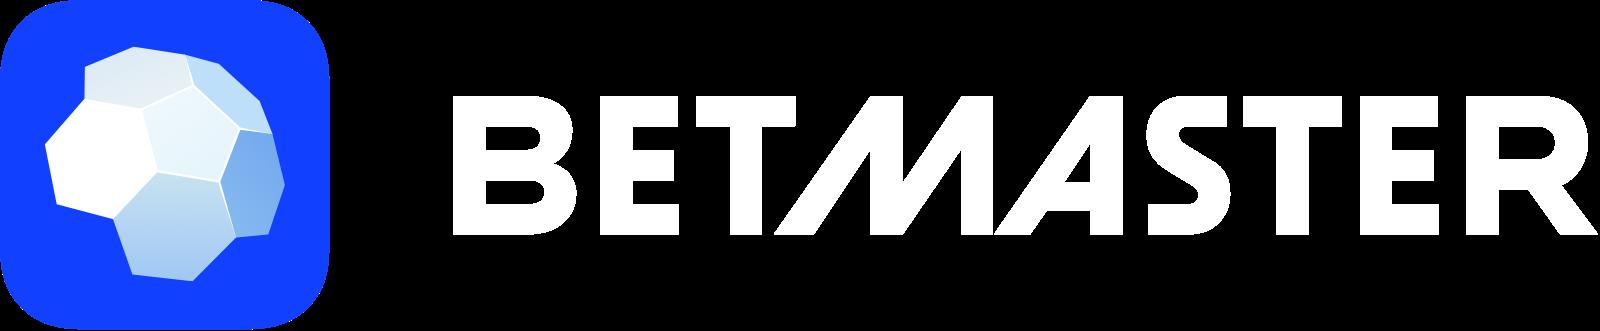 BetMaster.io